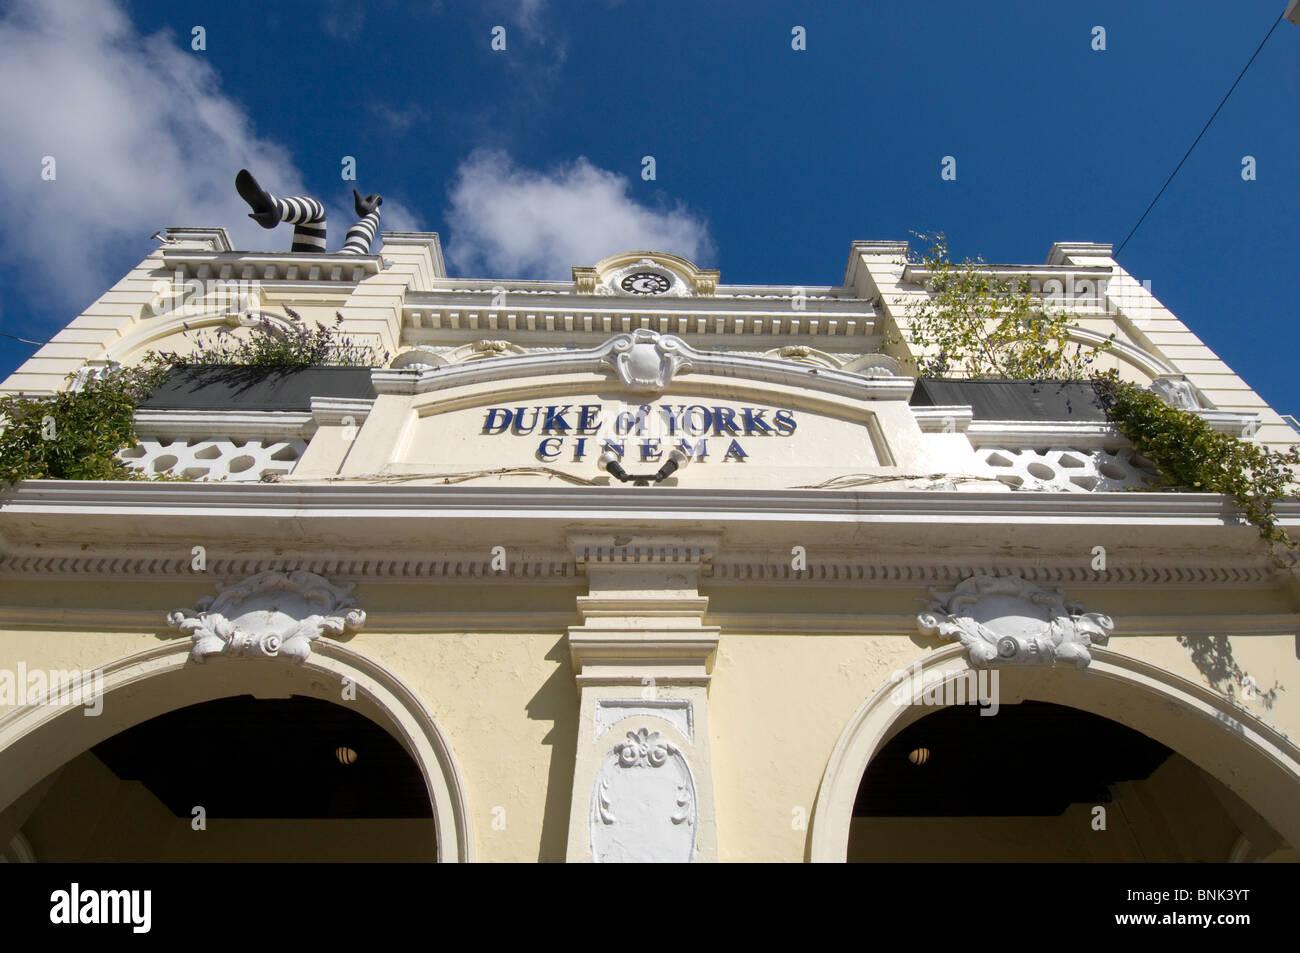 Herzog von Yorks Kino in Brighton, UK. Es feierte sein hundertjähriges Bestehen am 22. September 2010 damit Stockbild